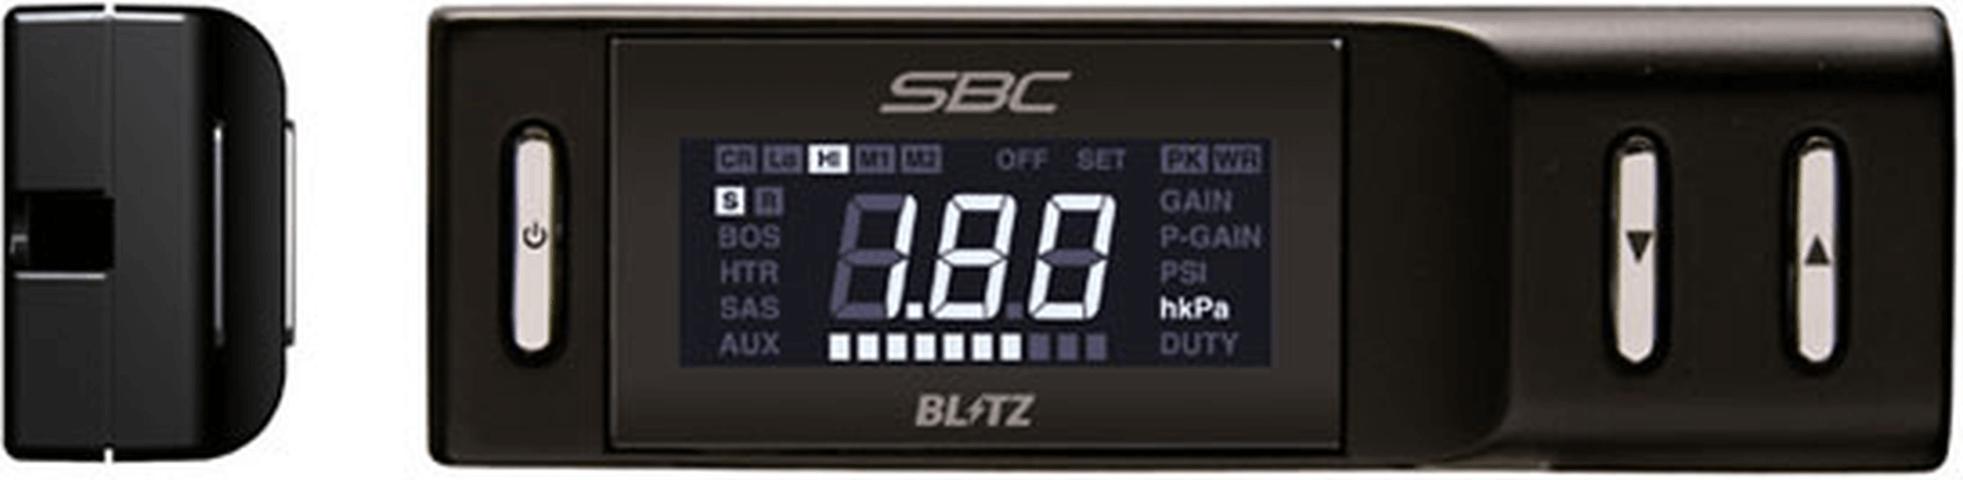 ZC11/21/31/71 スイフト 電子機器 ブーストコントローラー ブーストコントローラー本体 ブリッツ SBC